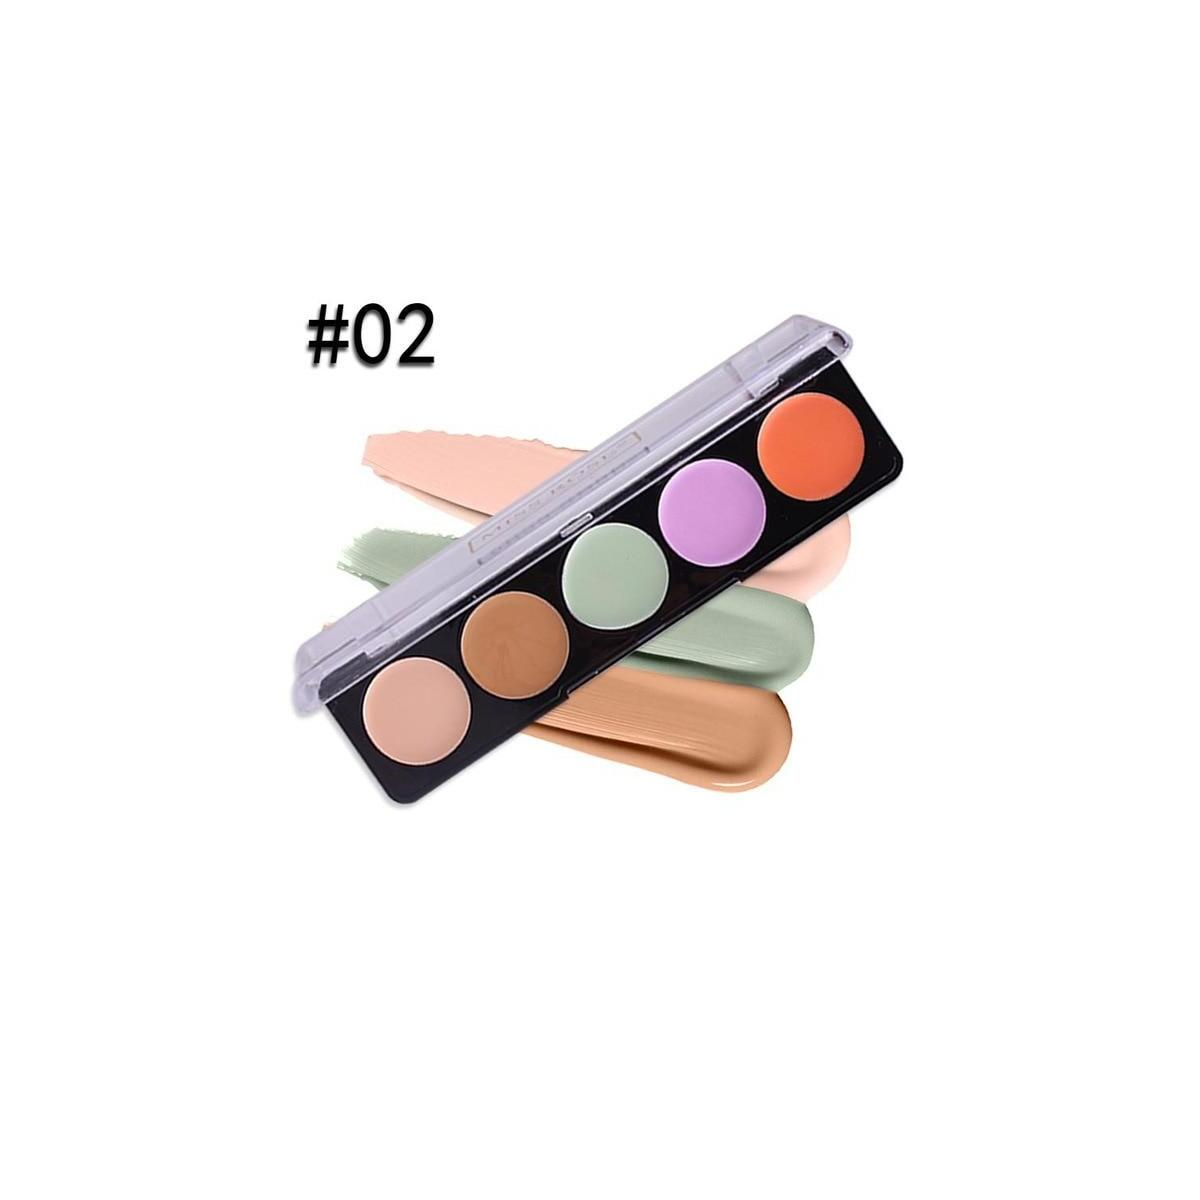 Miss Rose Professional Makeup 5 Colors Concealer Cream Palette, 02